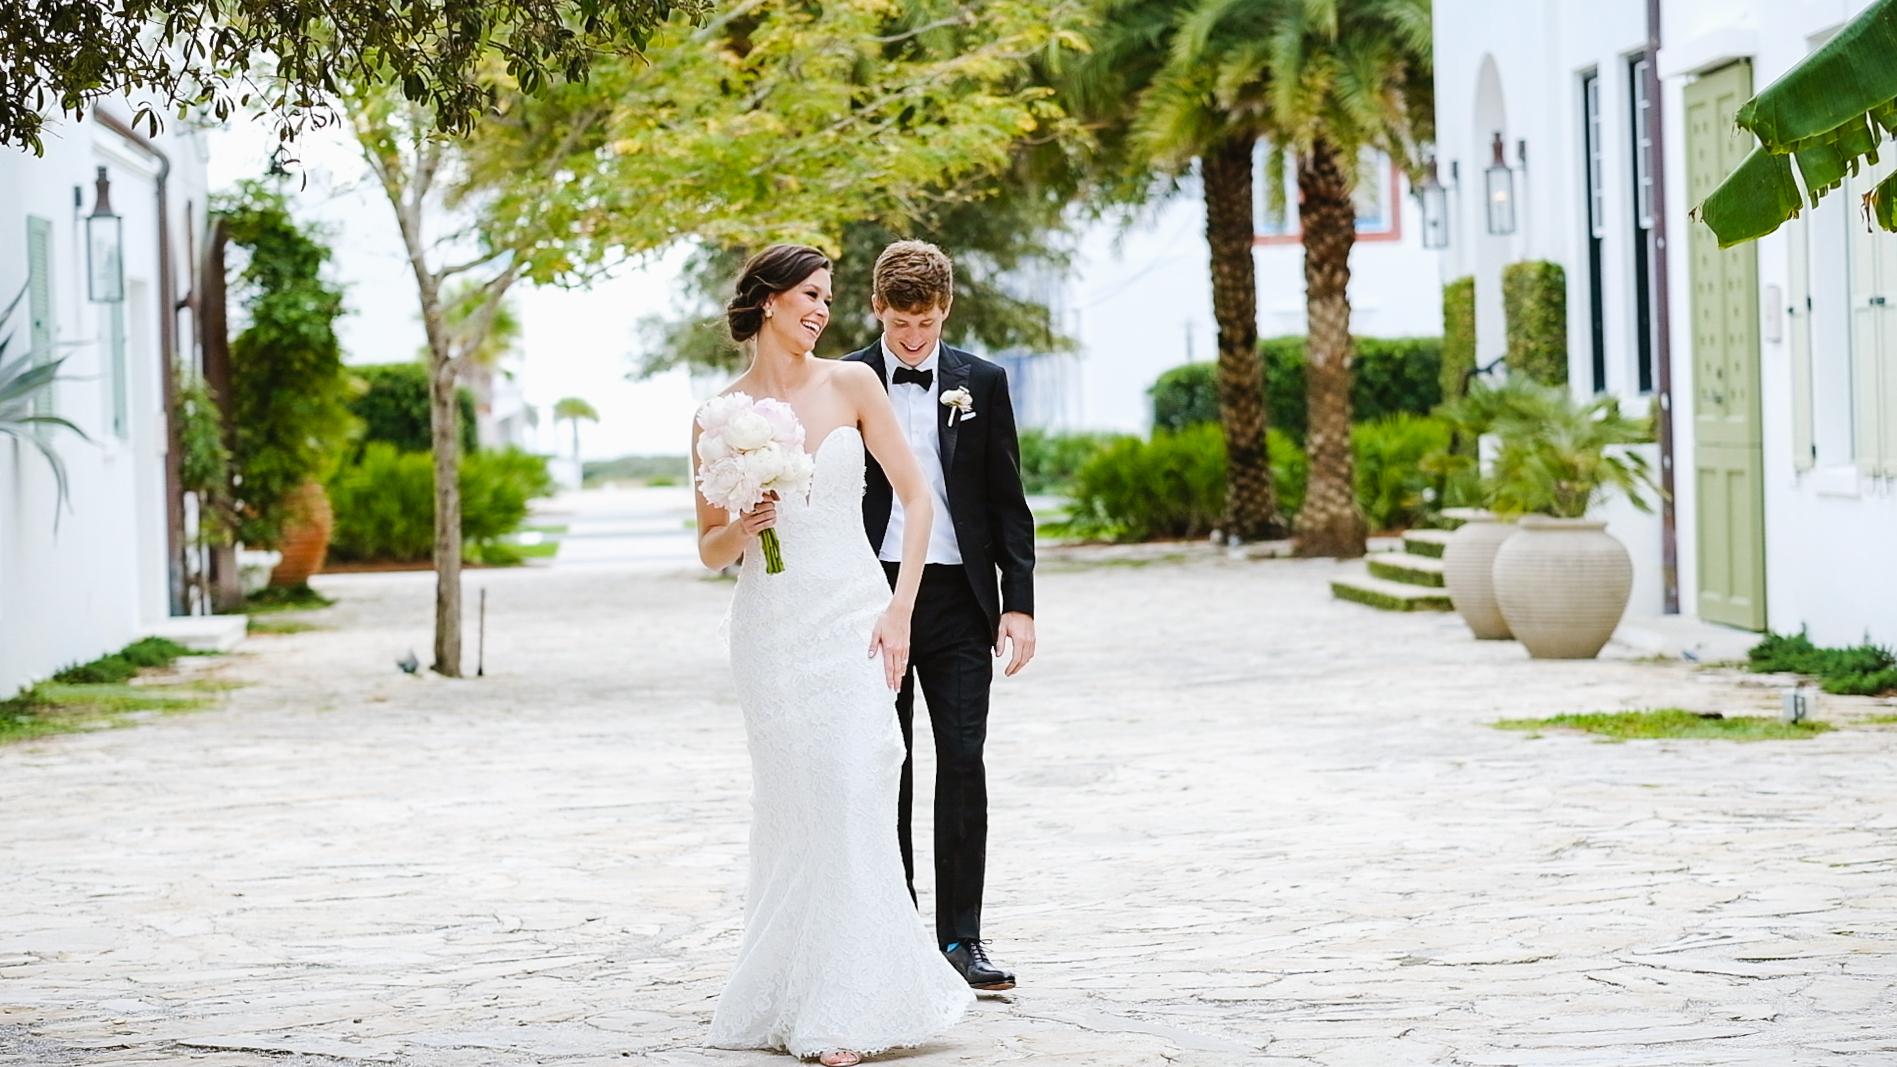 Betsy + Brooks | Alys Beach, Florida | Alys Beach